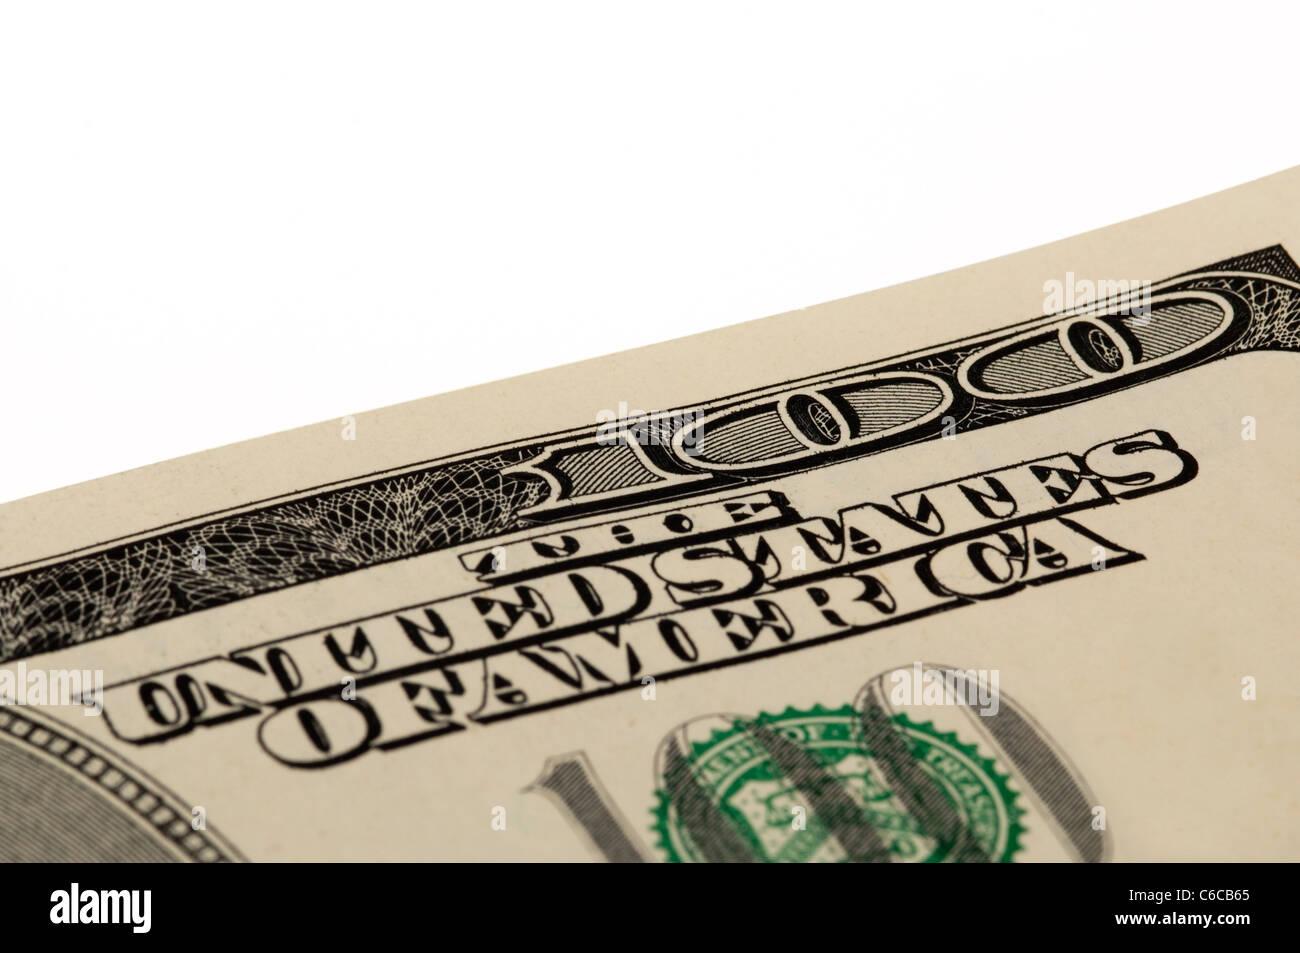 Macro shot of a corner of the US $100 bill - Stock Image